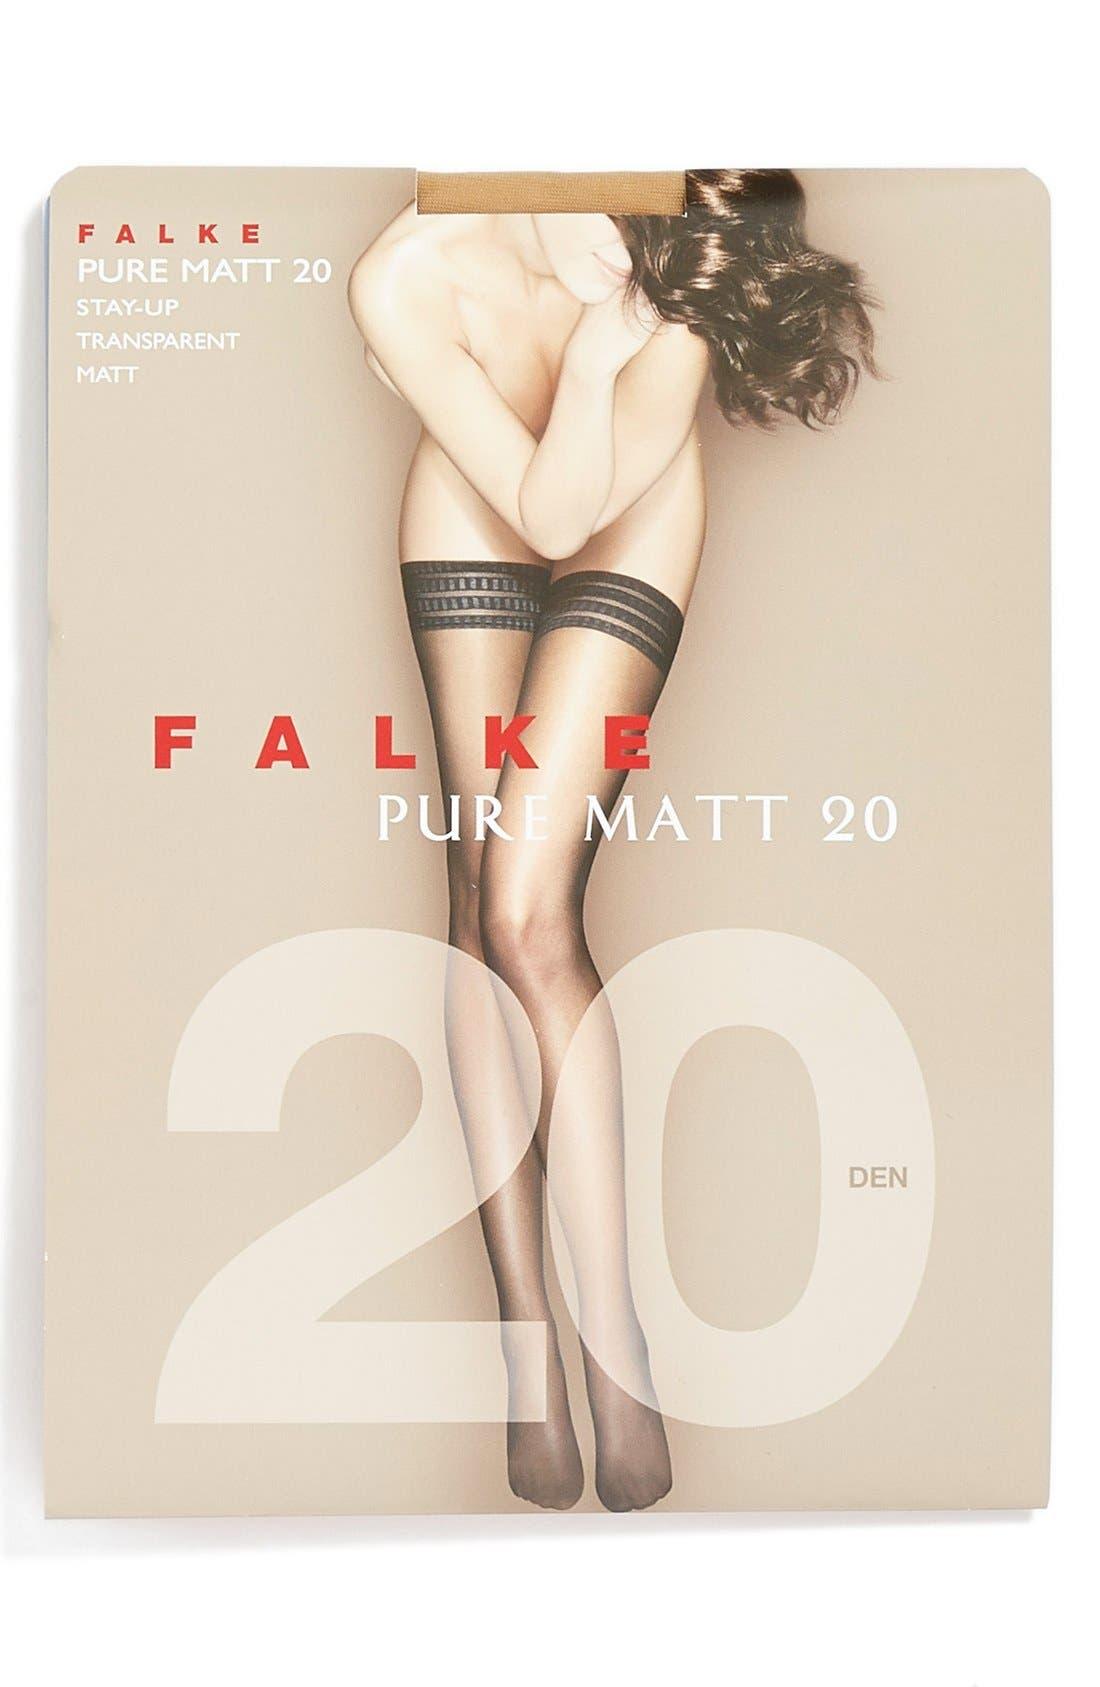 'Pure Matt 20' Stay-Up Stockings,                             Alternate thumbnail 13, color,